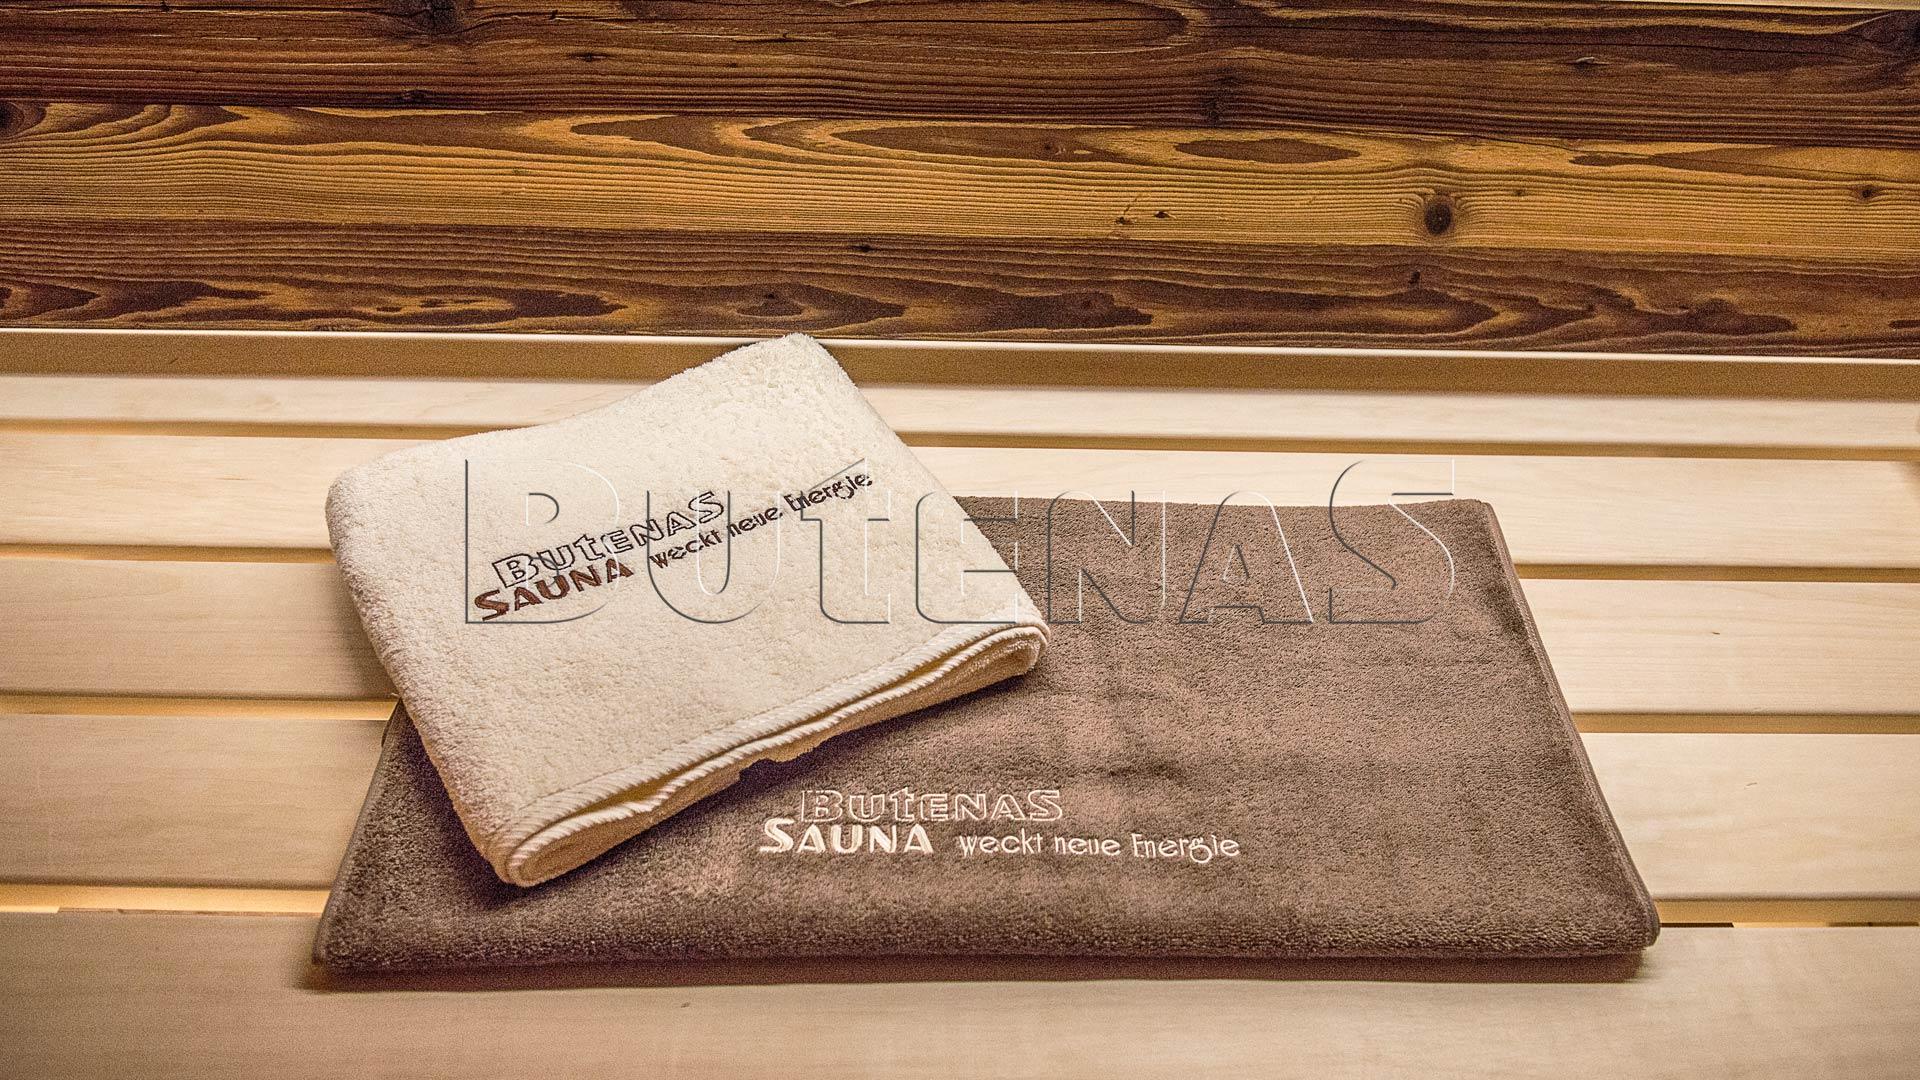 Butenas Sauna Handtuch